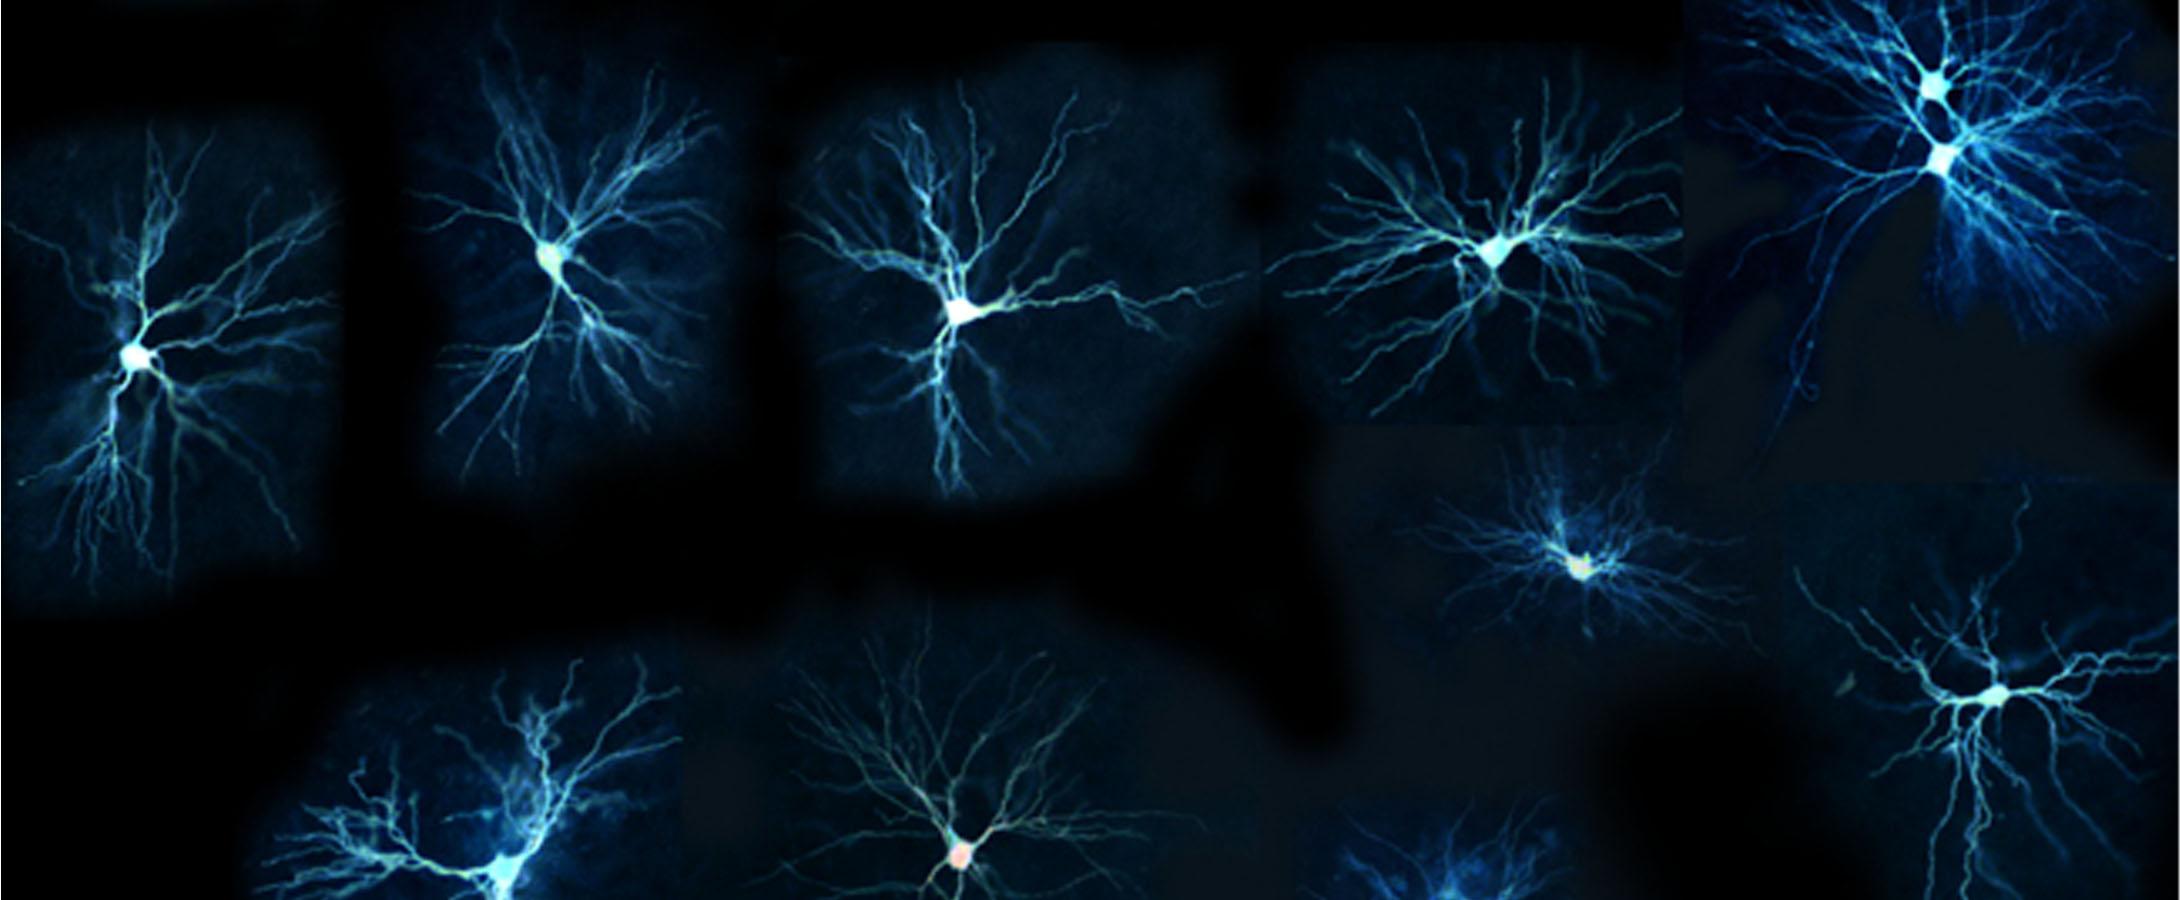 scientific image courtesy of SfN journals